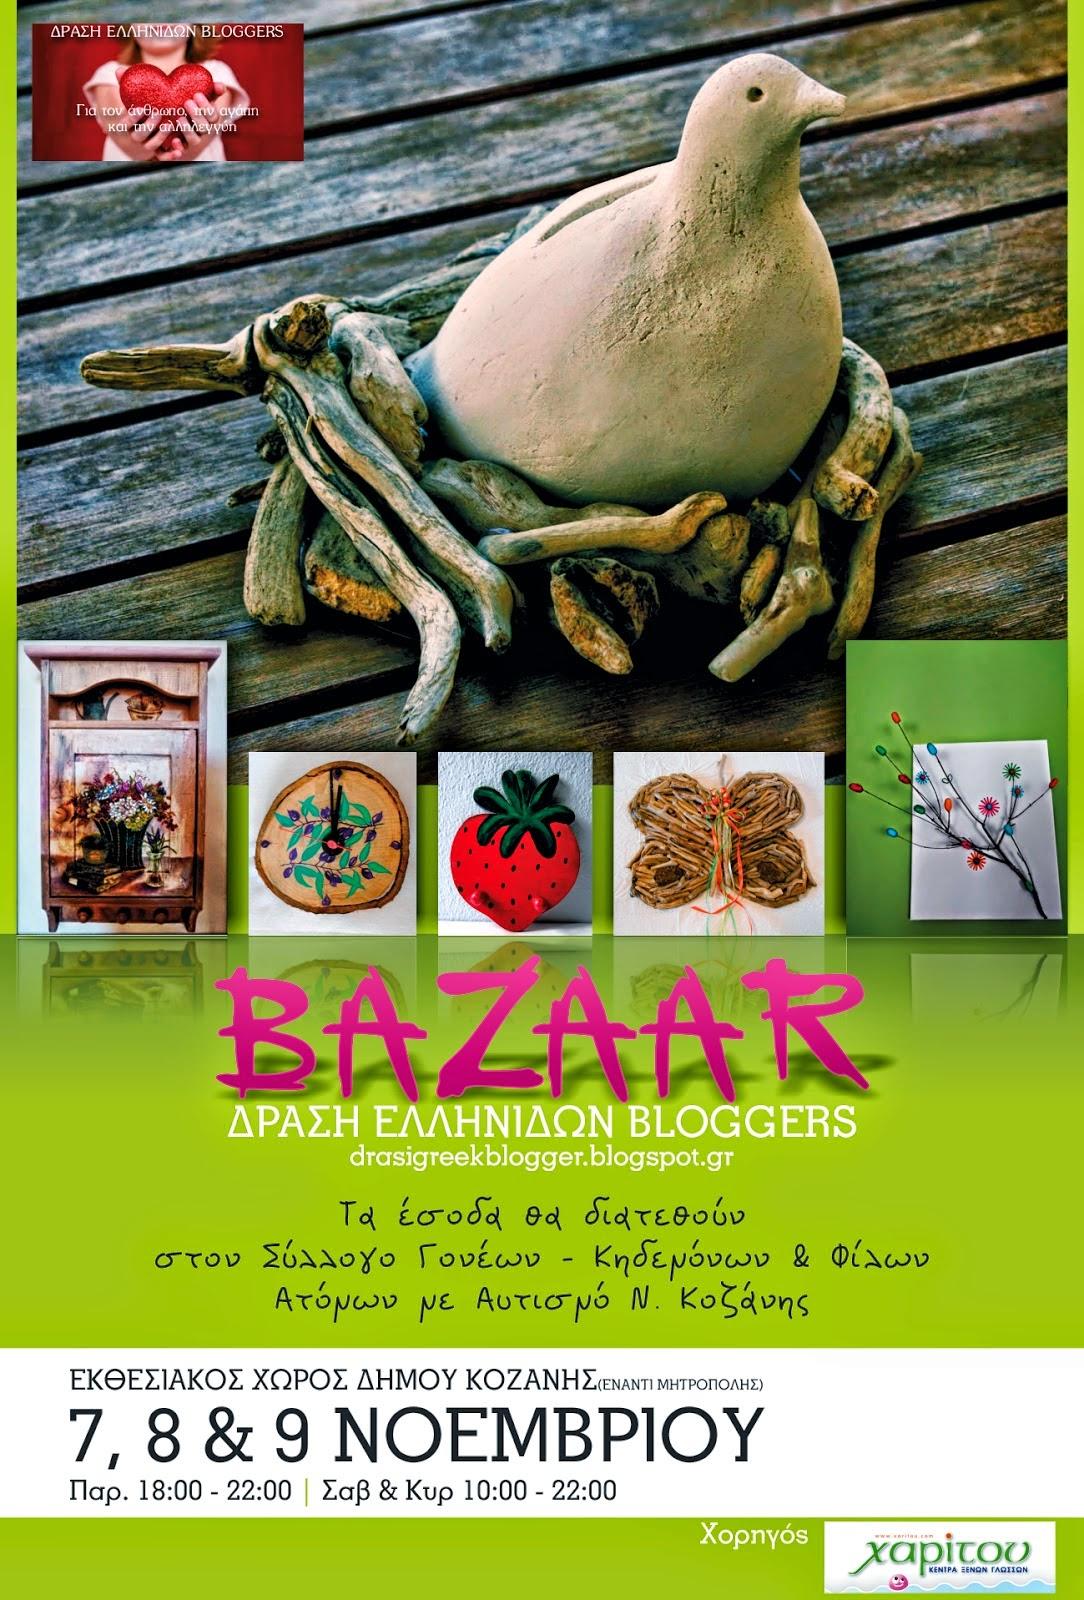 bazaar..Ν.Koζανης